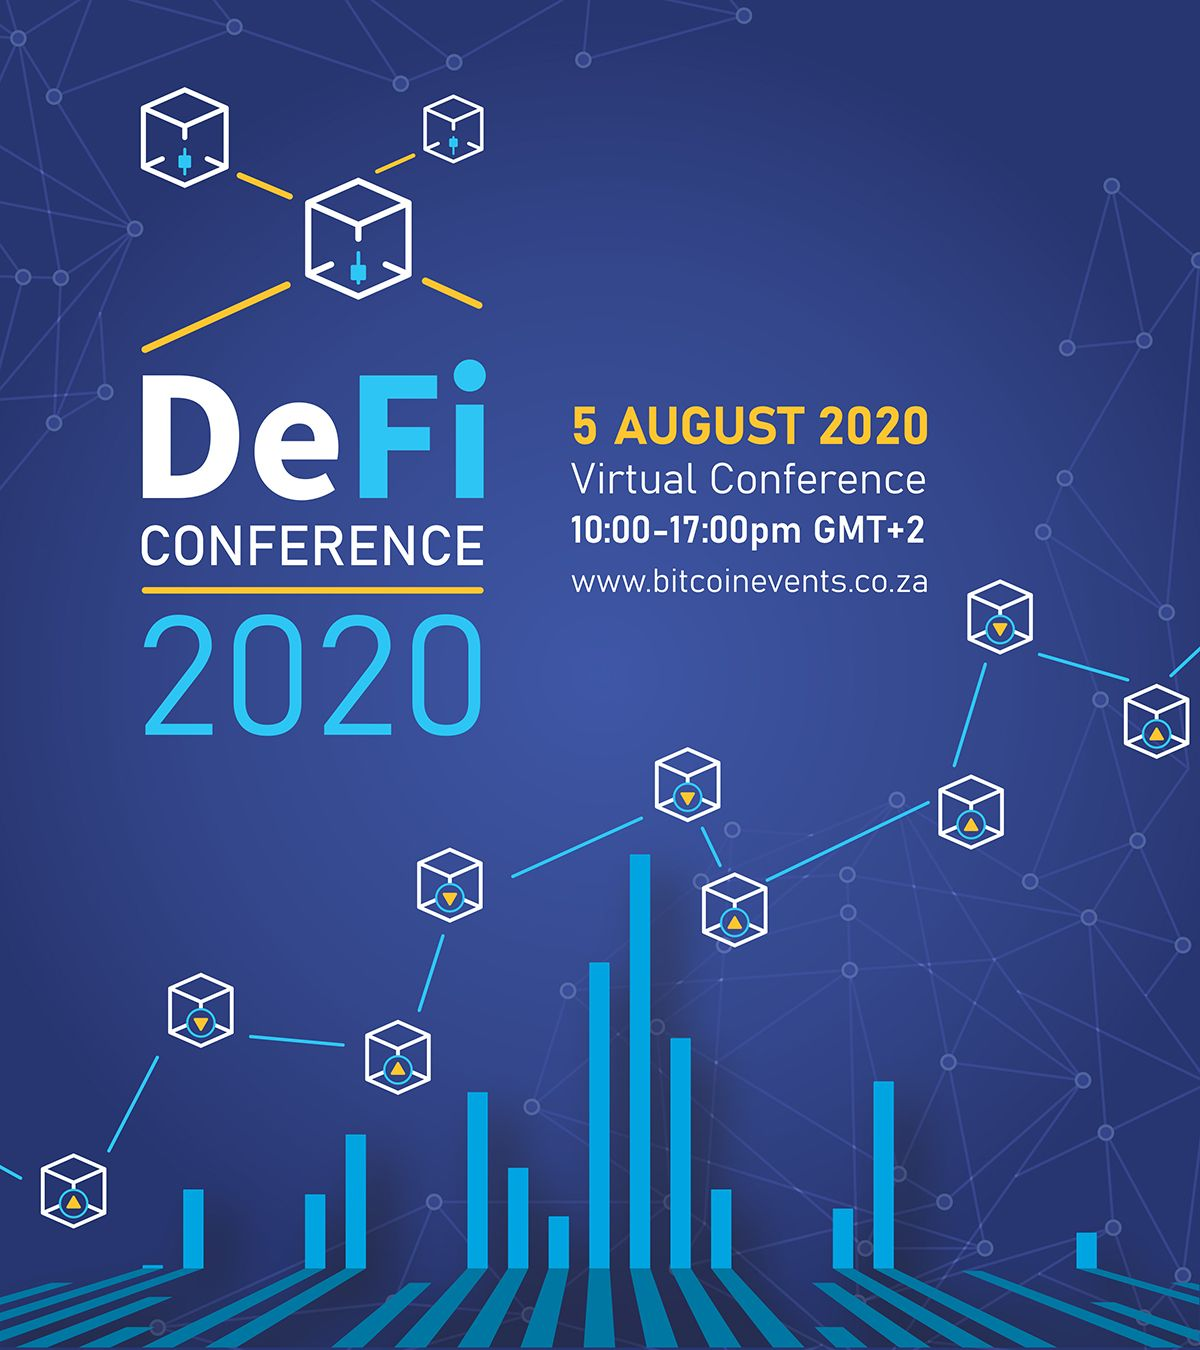 DEFI-CONFER-2020-AD-for-media